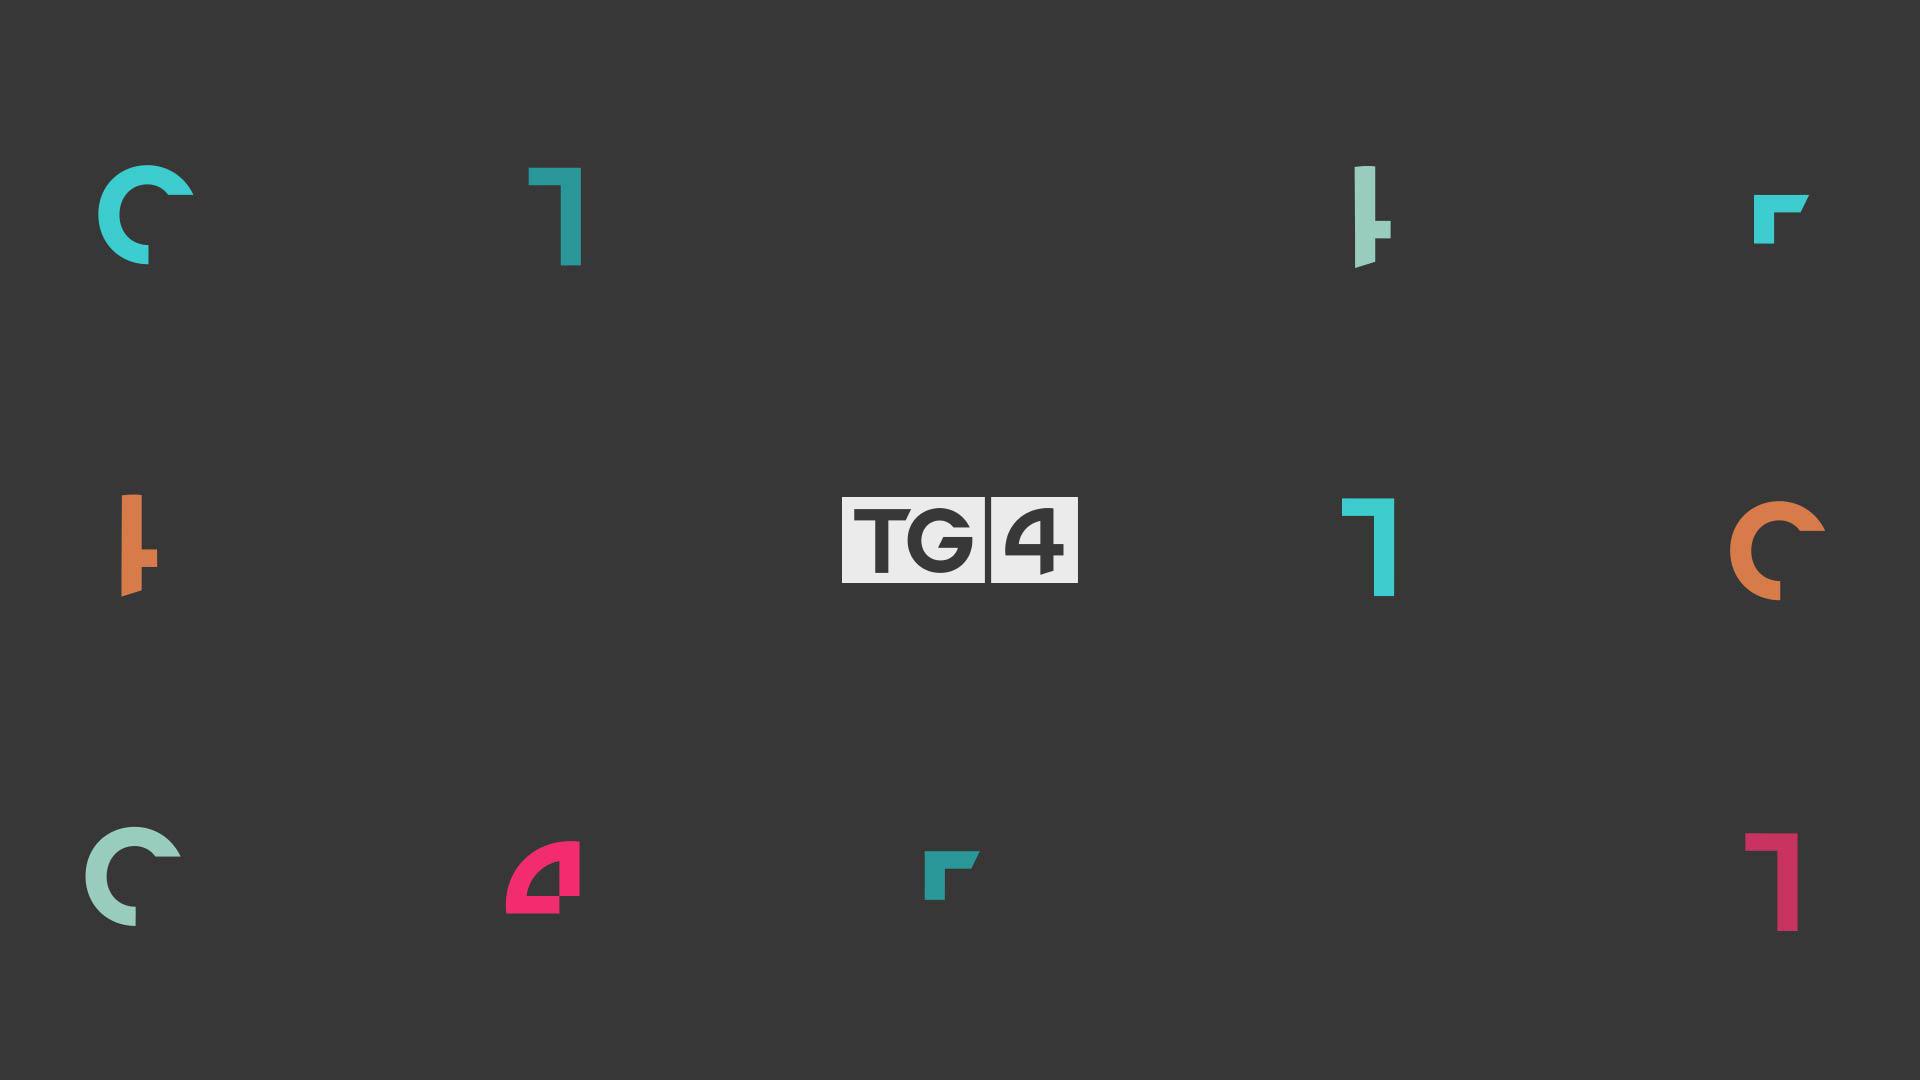 TG4 Television | Irish TV | Irish Television Channel | Súil Eile | Gaeilge